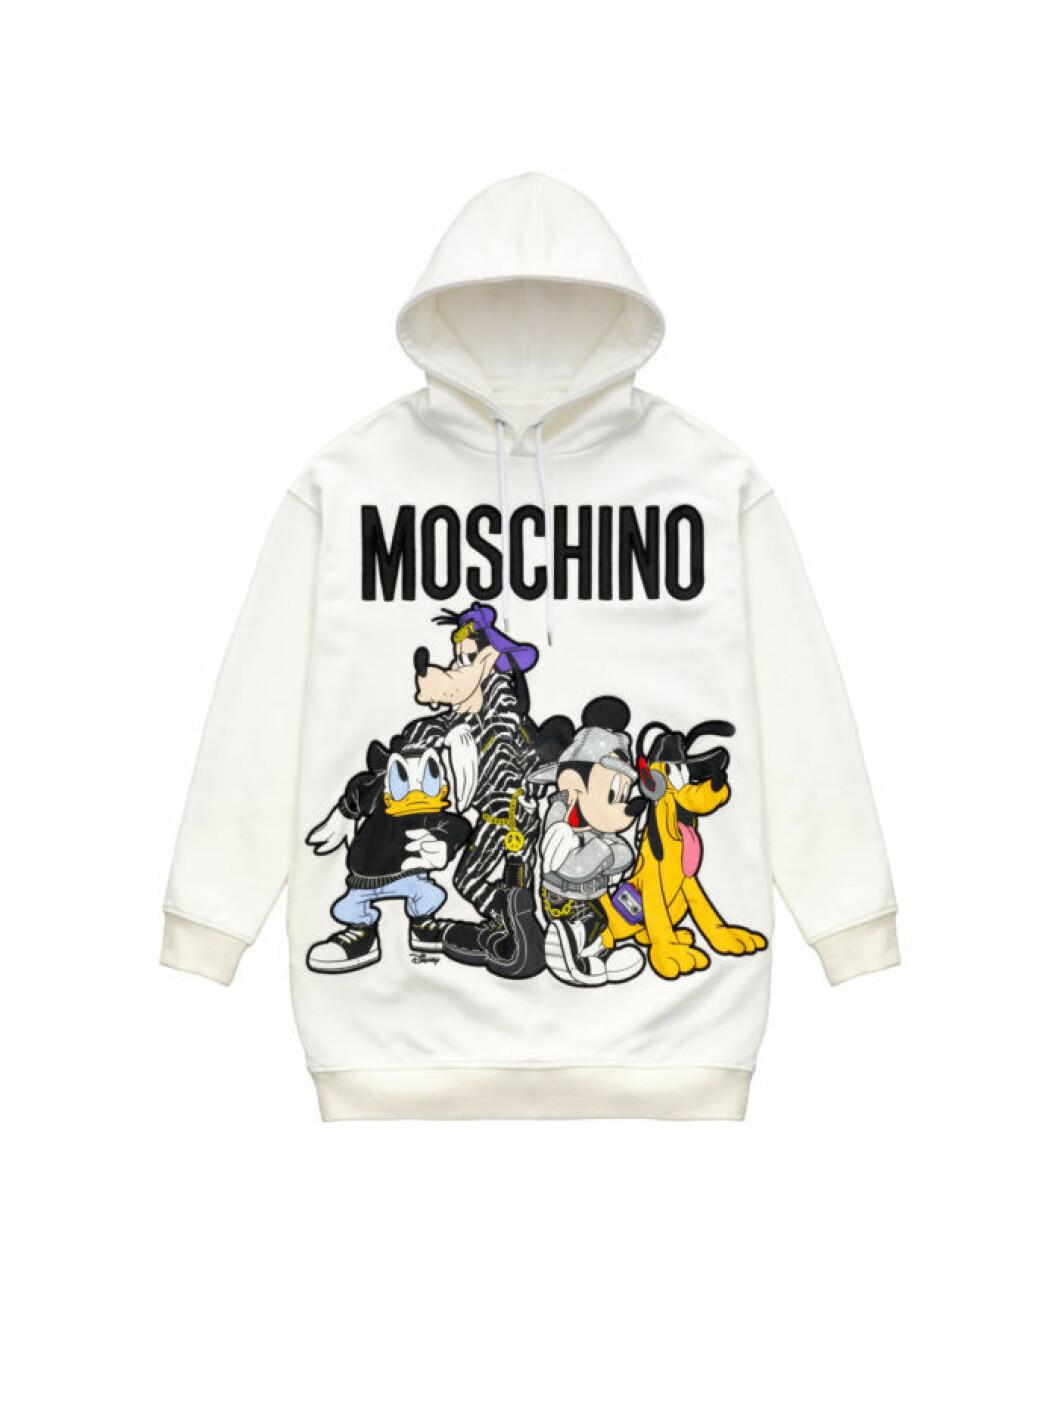 Vit hoodie med Disneyfigurer Moschino [tv] H&M